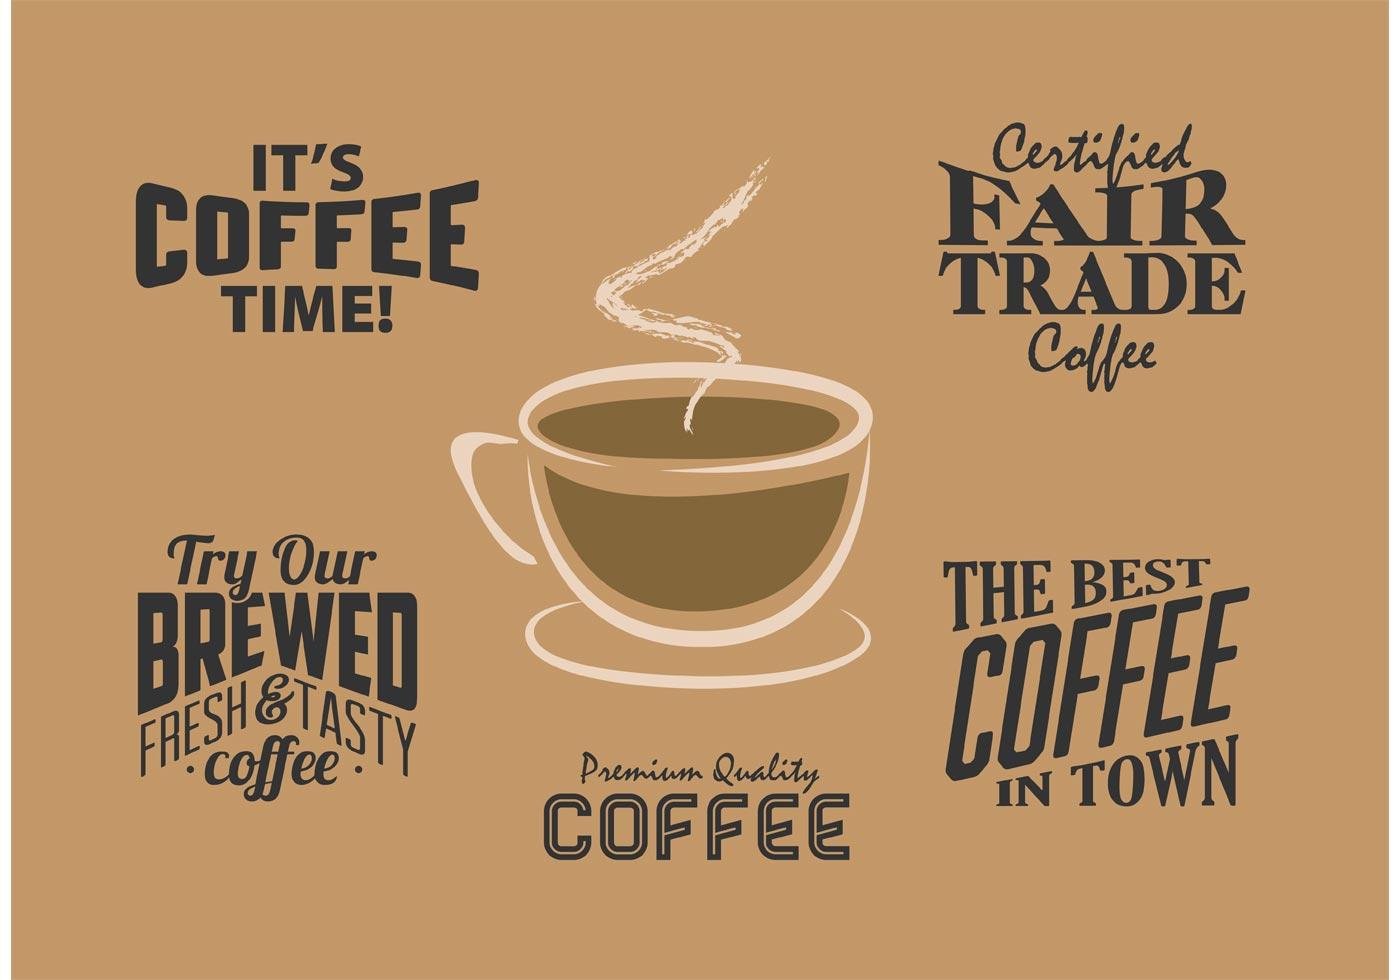 Vintage Coffee Labels Vector Retro Typographic Design Elements